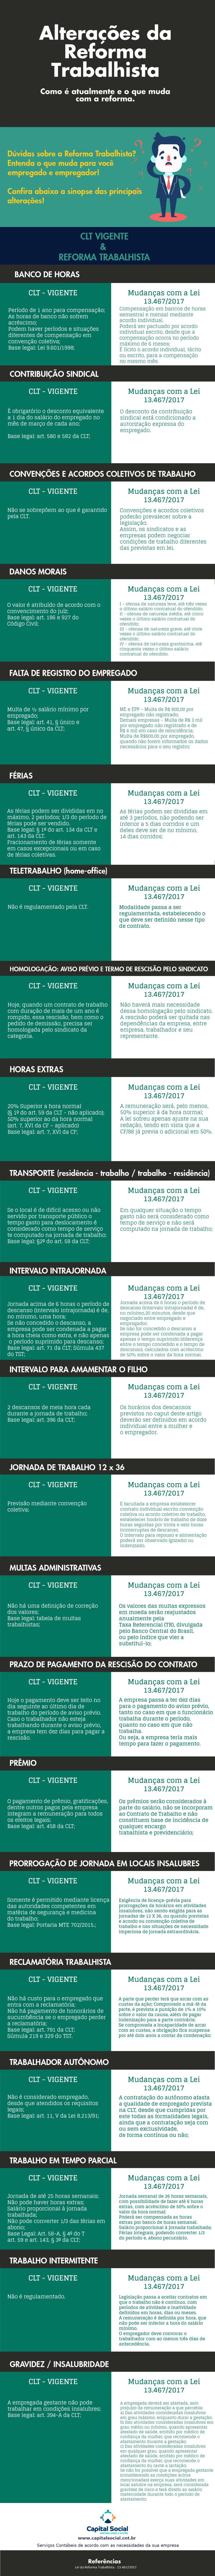 Infográfico - Reforma Trabalhista